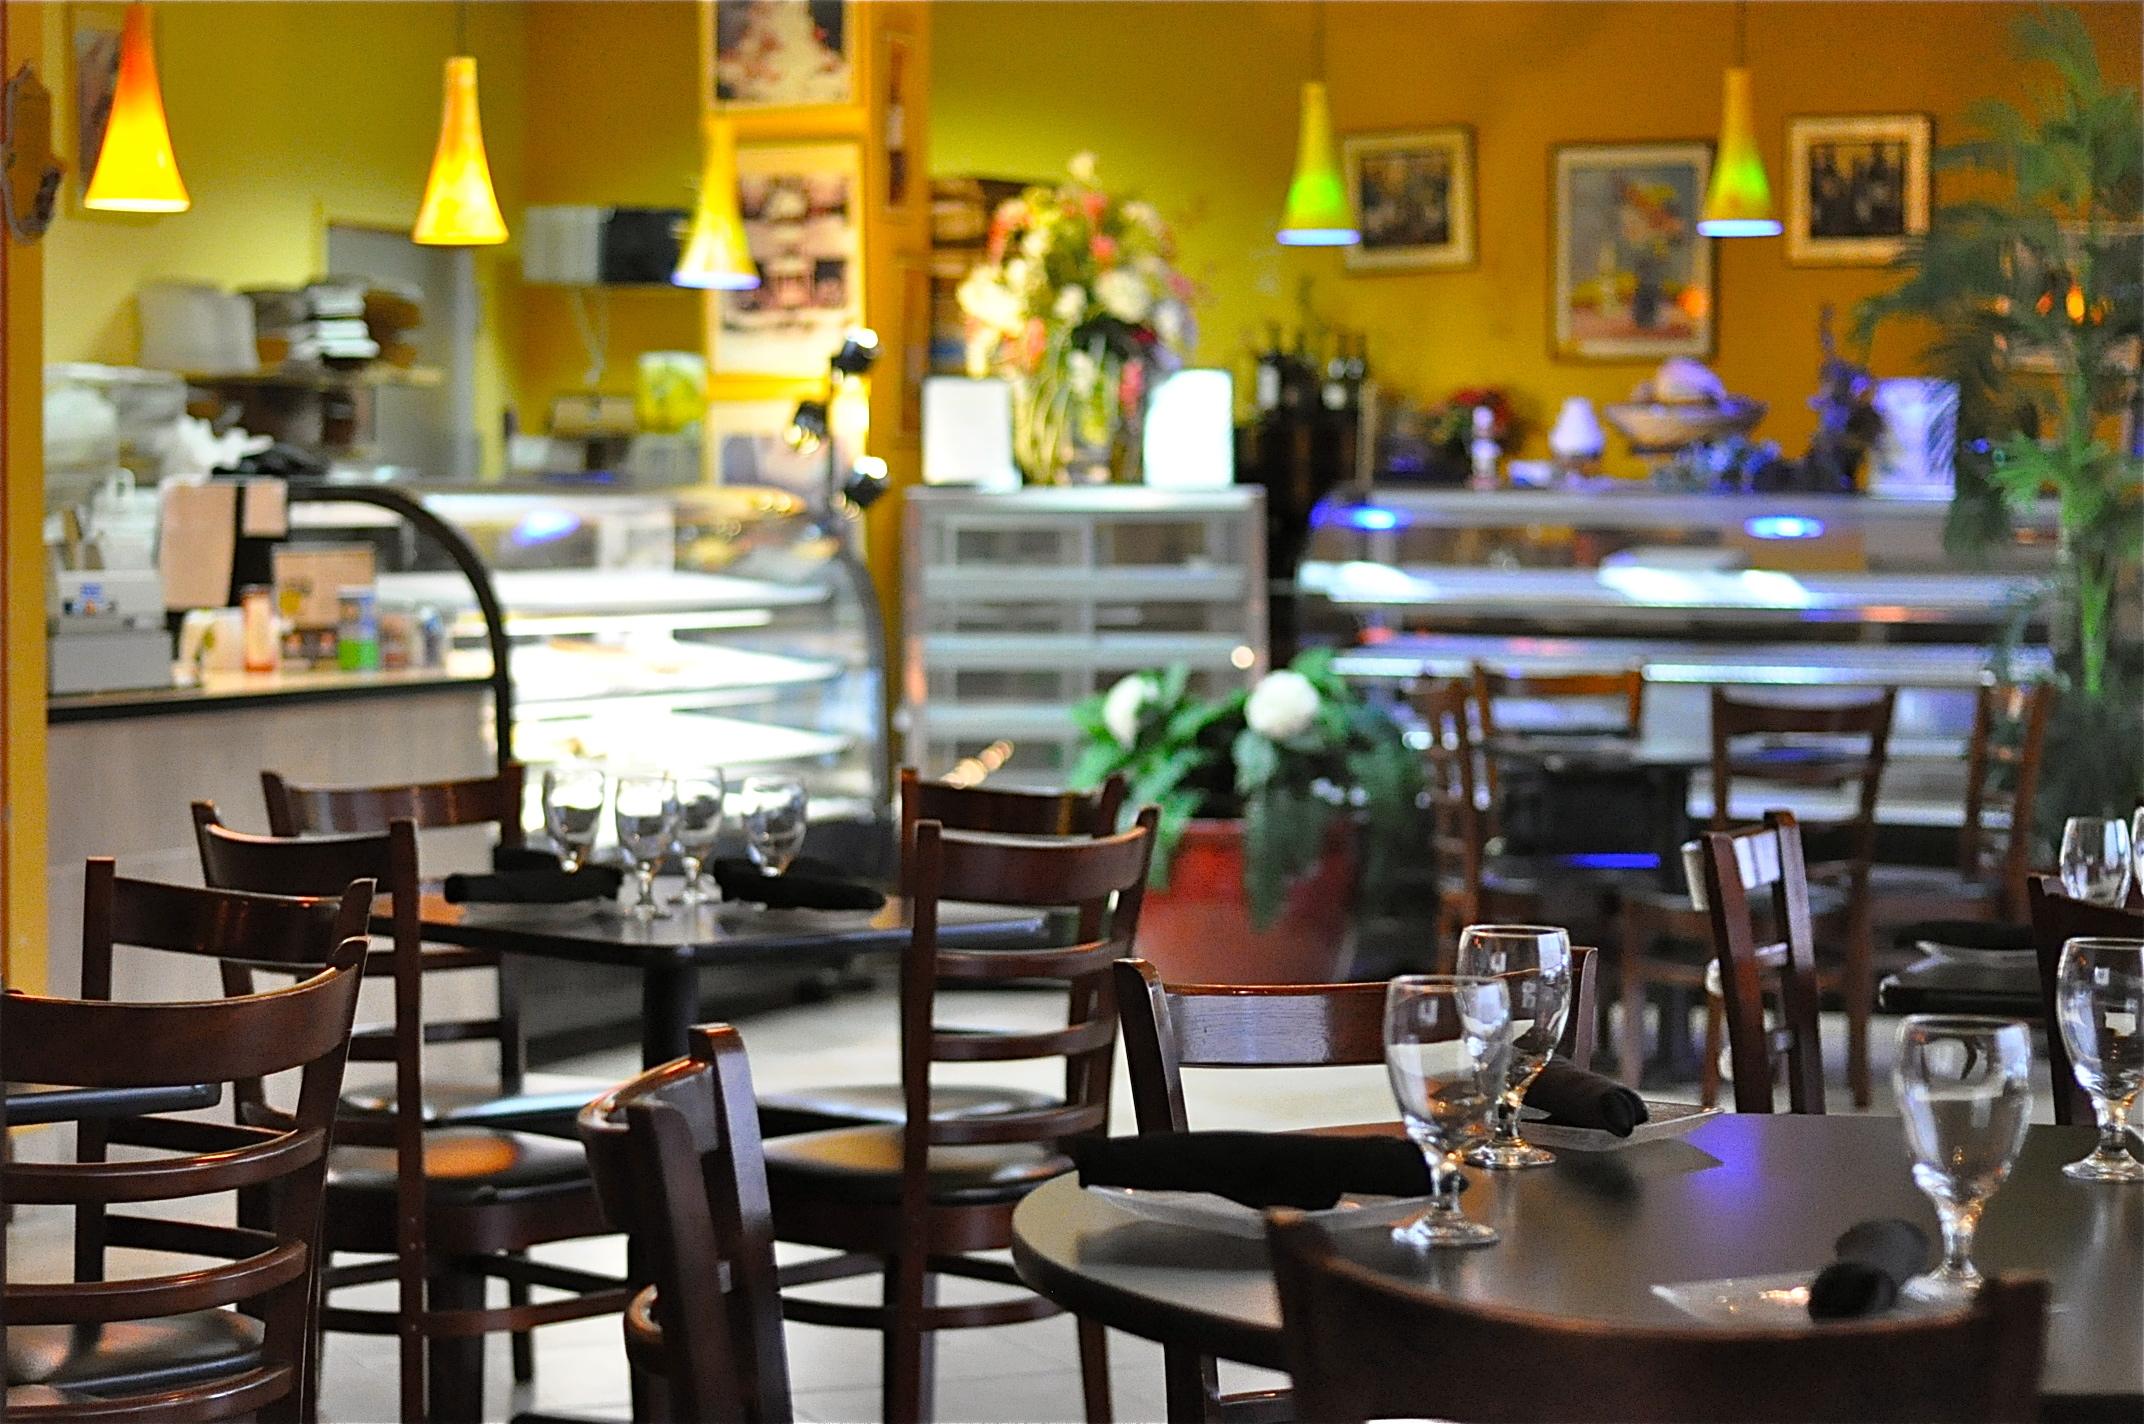 Kosher Restaurant, Bakery, & Cafe in Silver Spring, Maryland